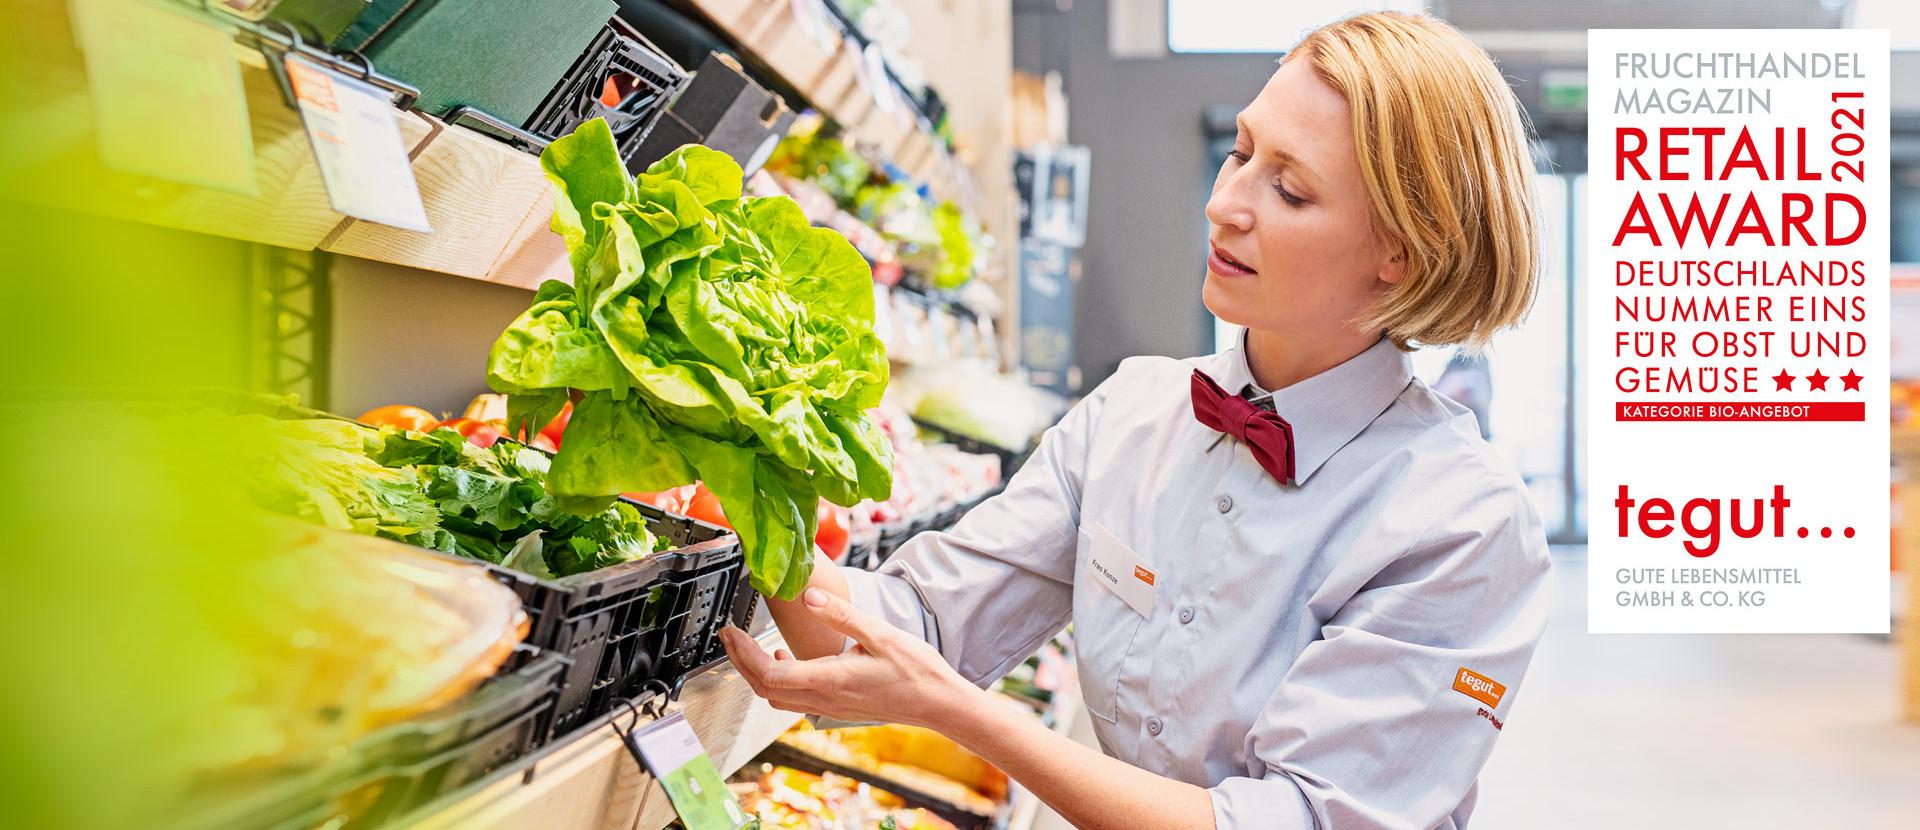 Fruchthandel RetailAward21 Frau räumt Salat in Obstabteilung in Regal